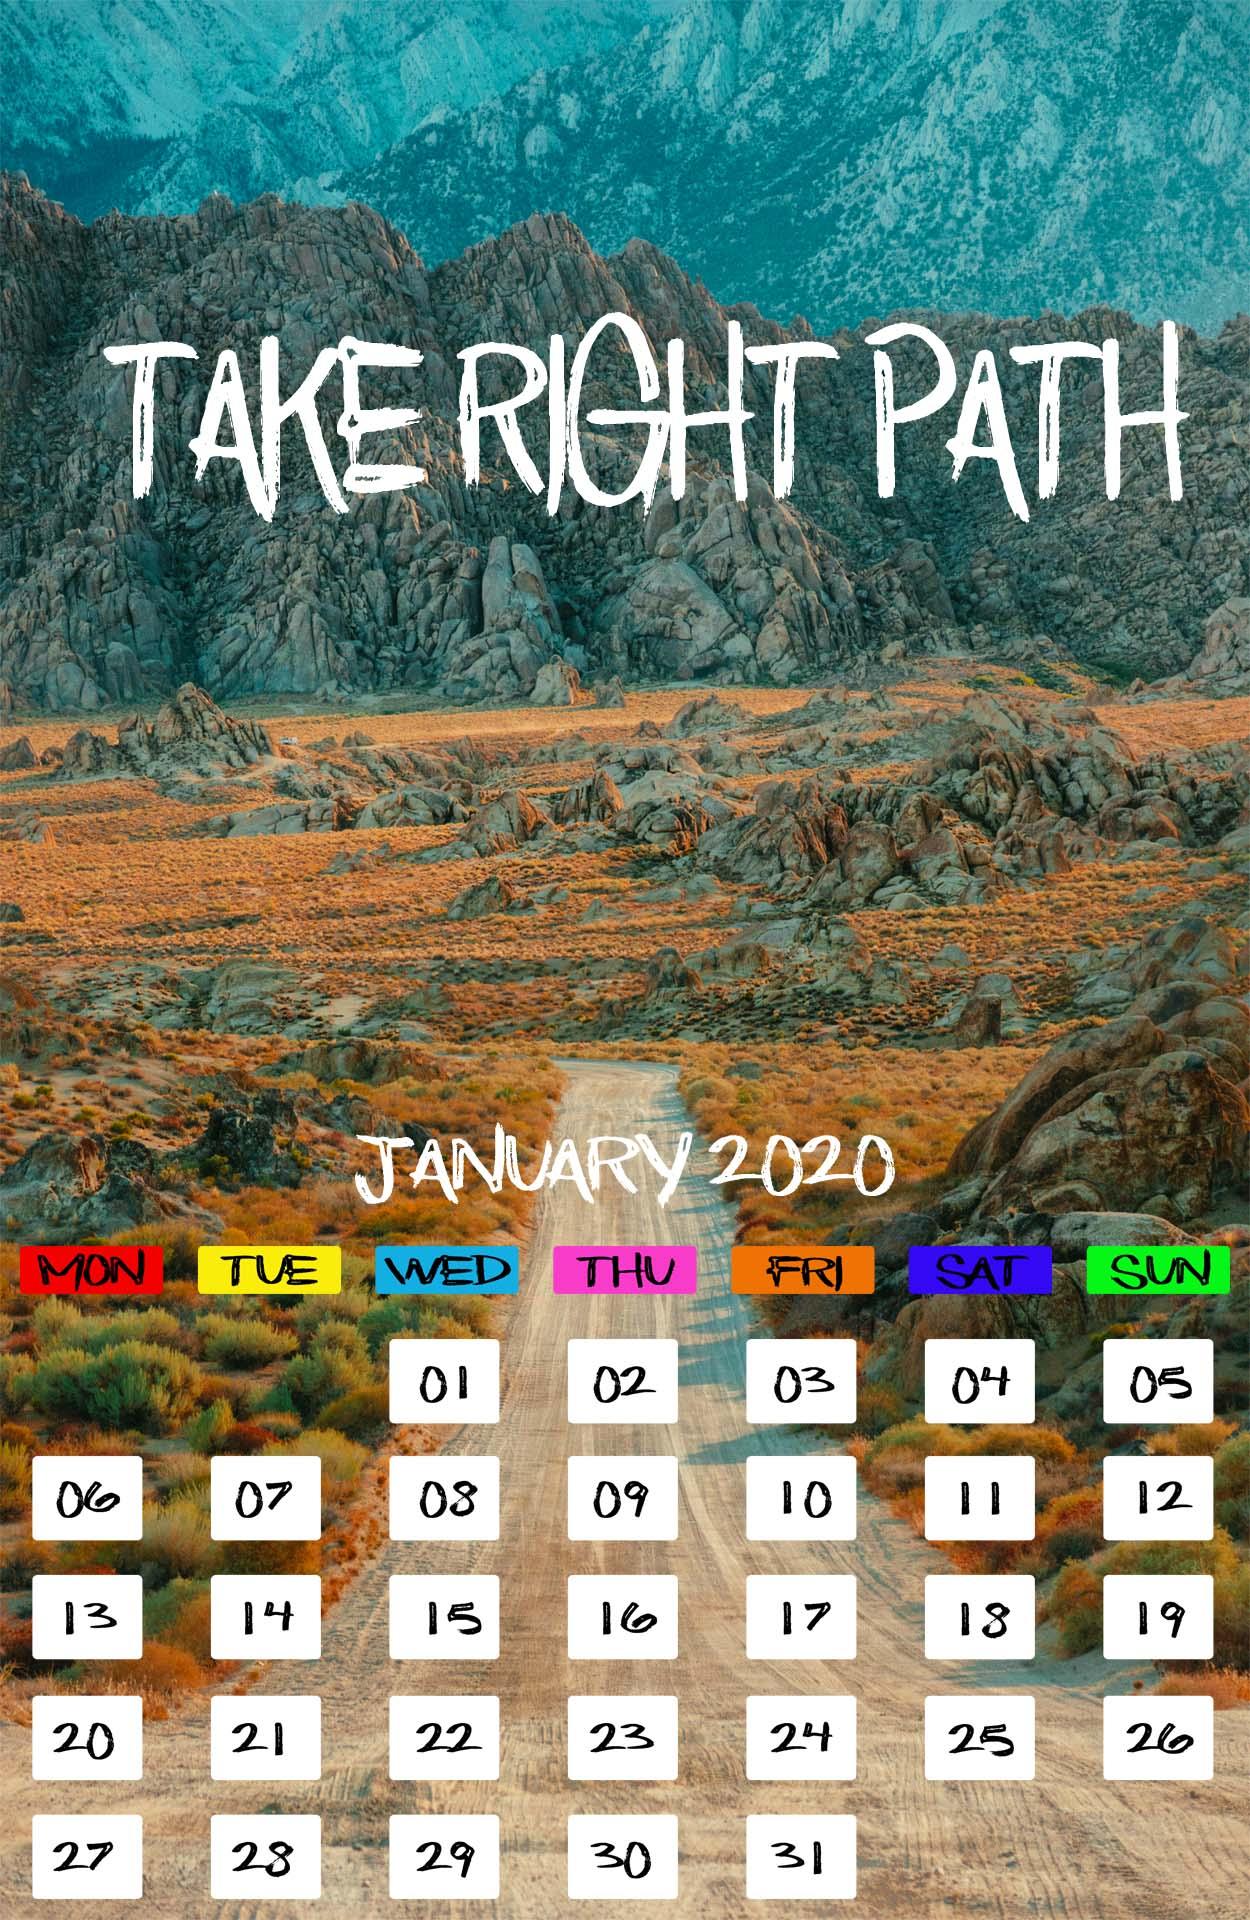 January 2020 Calendar iPhone Desktop Mobile Tablet Wallpapers 1250x1920